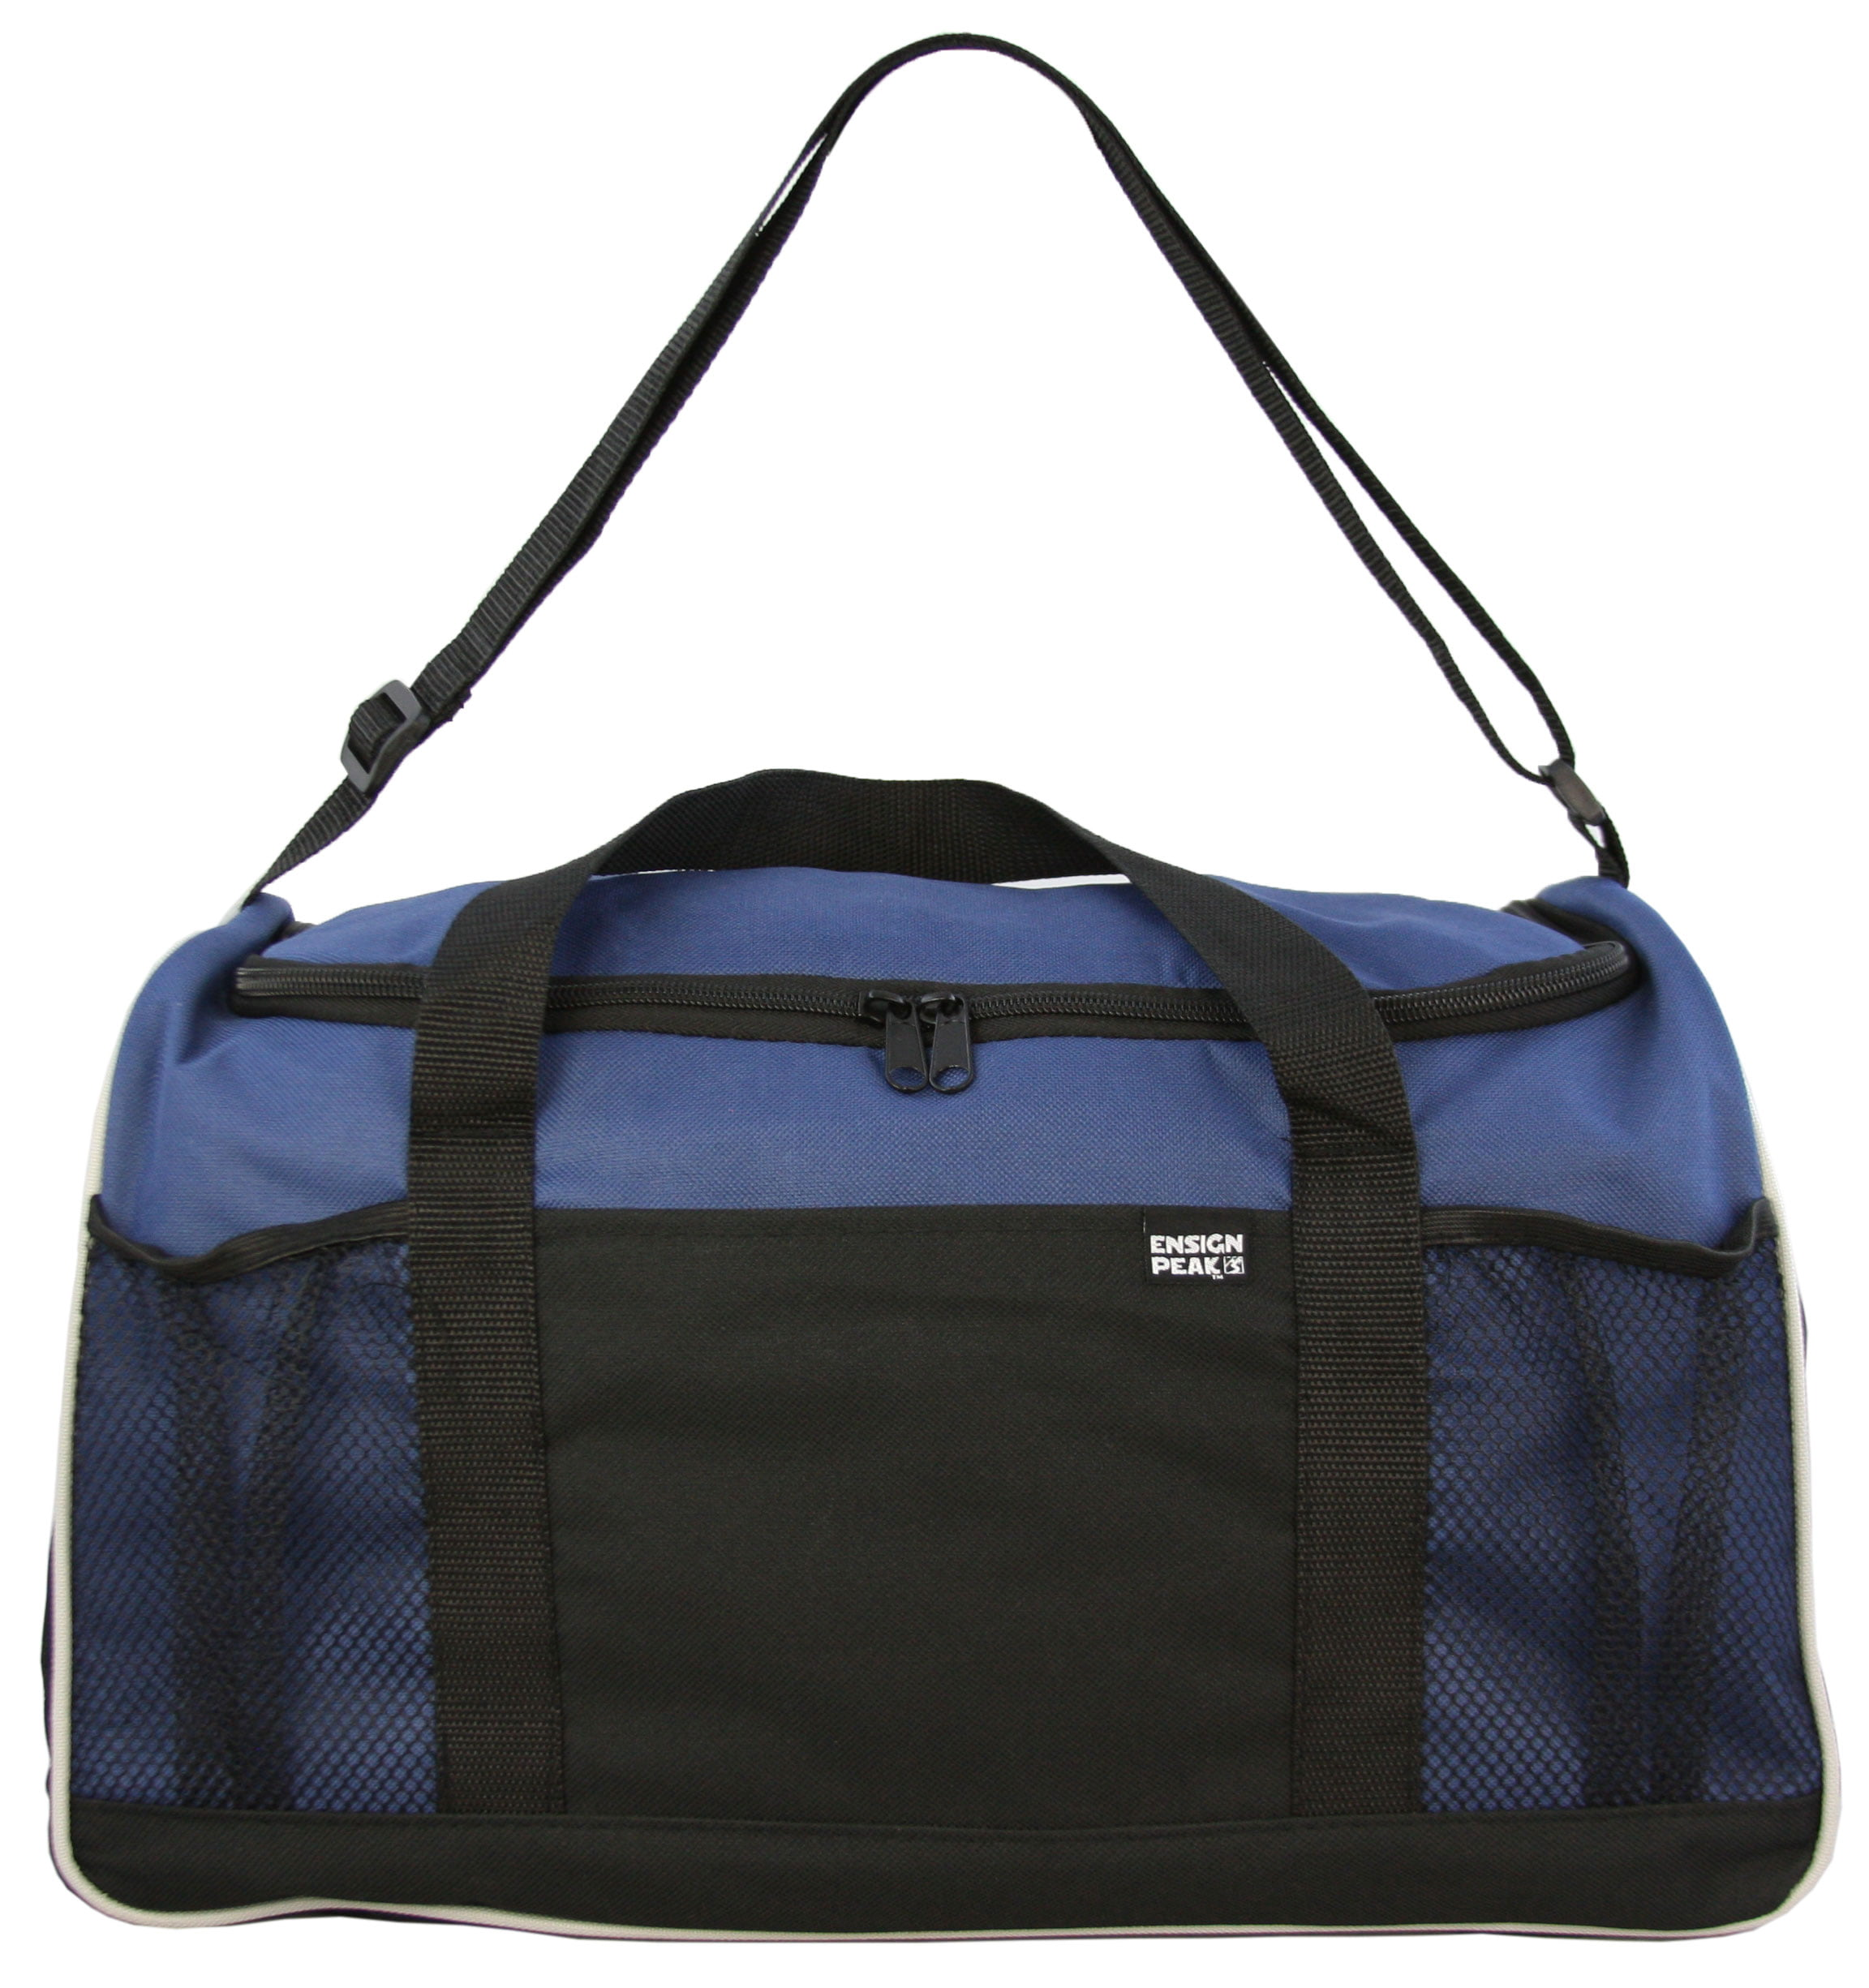 Travel Luggage Duffle Bag Lightweight Portable Handbag Animals Yellow Eyes Lizard Large Capacity Waterproof Foldable Storage Tote